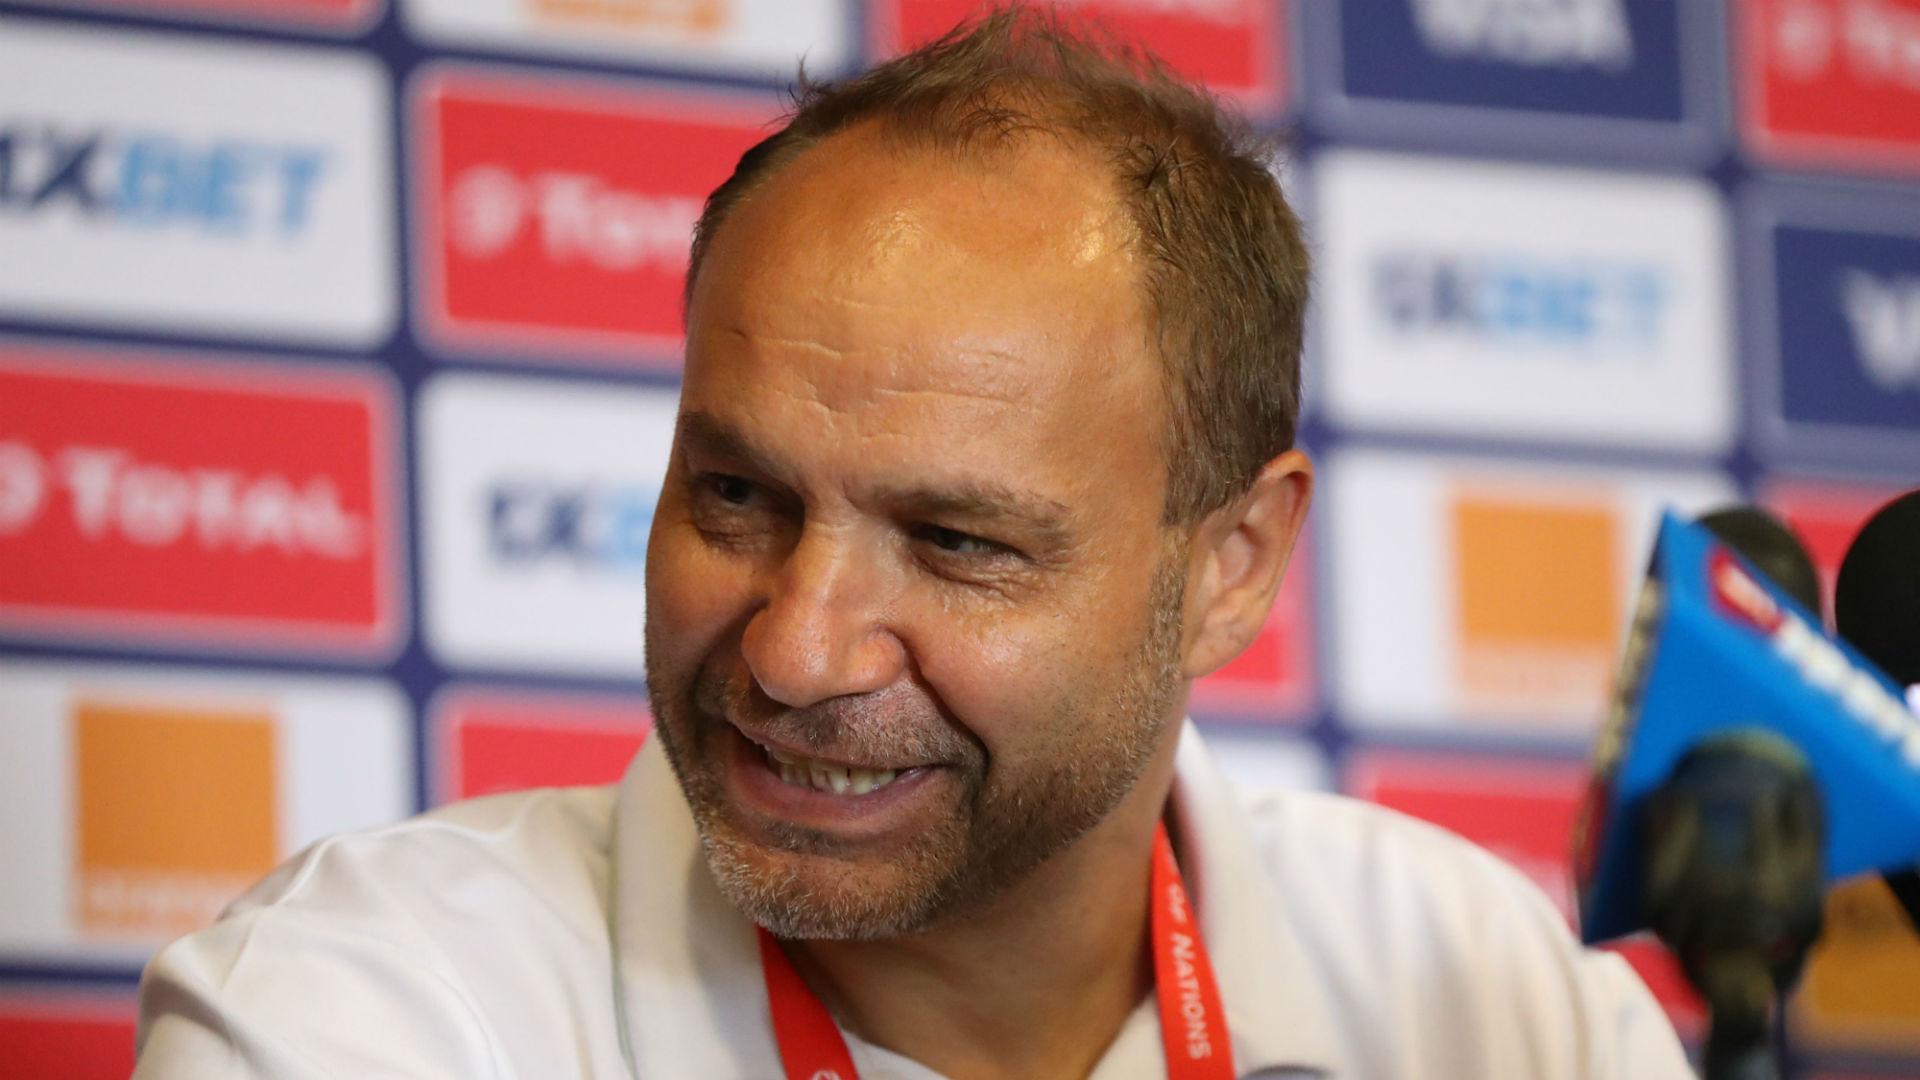 Afcon 2019: Kenya lacked the experience to trouble Algeria – Sebastien Migne